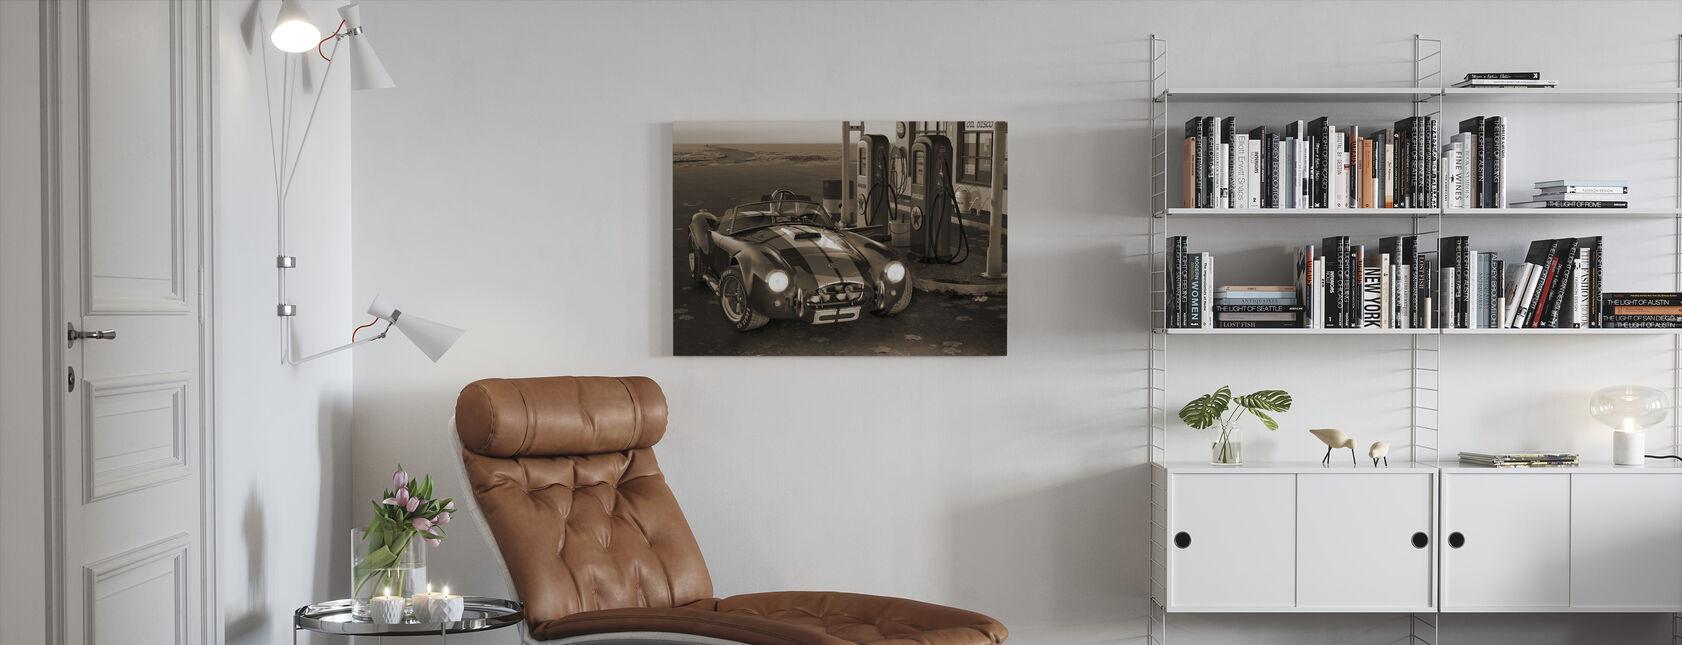 Gas Stop Sepia - Canvas print - Living Room